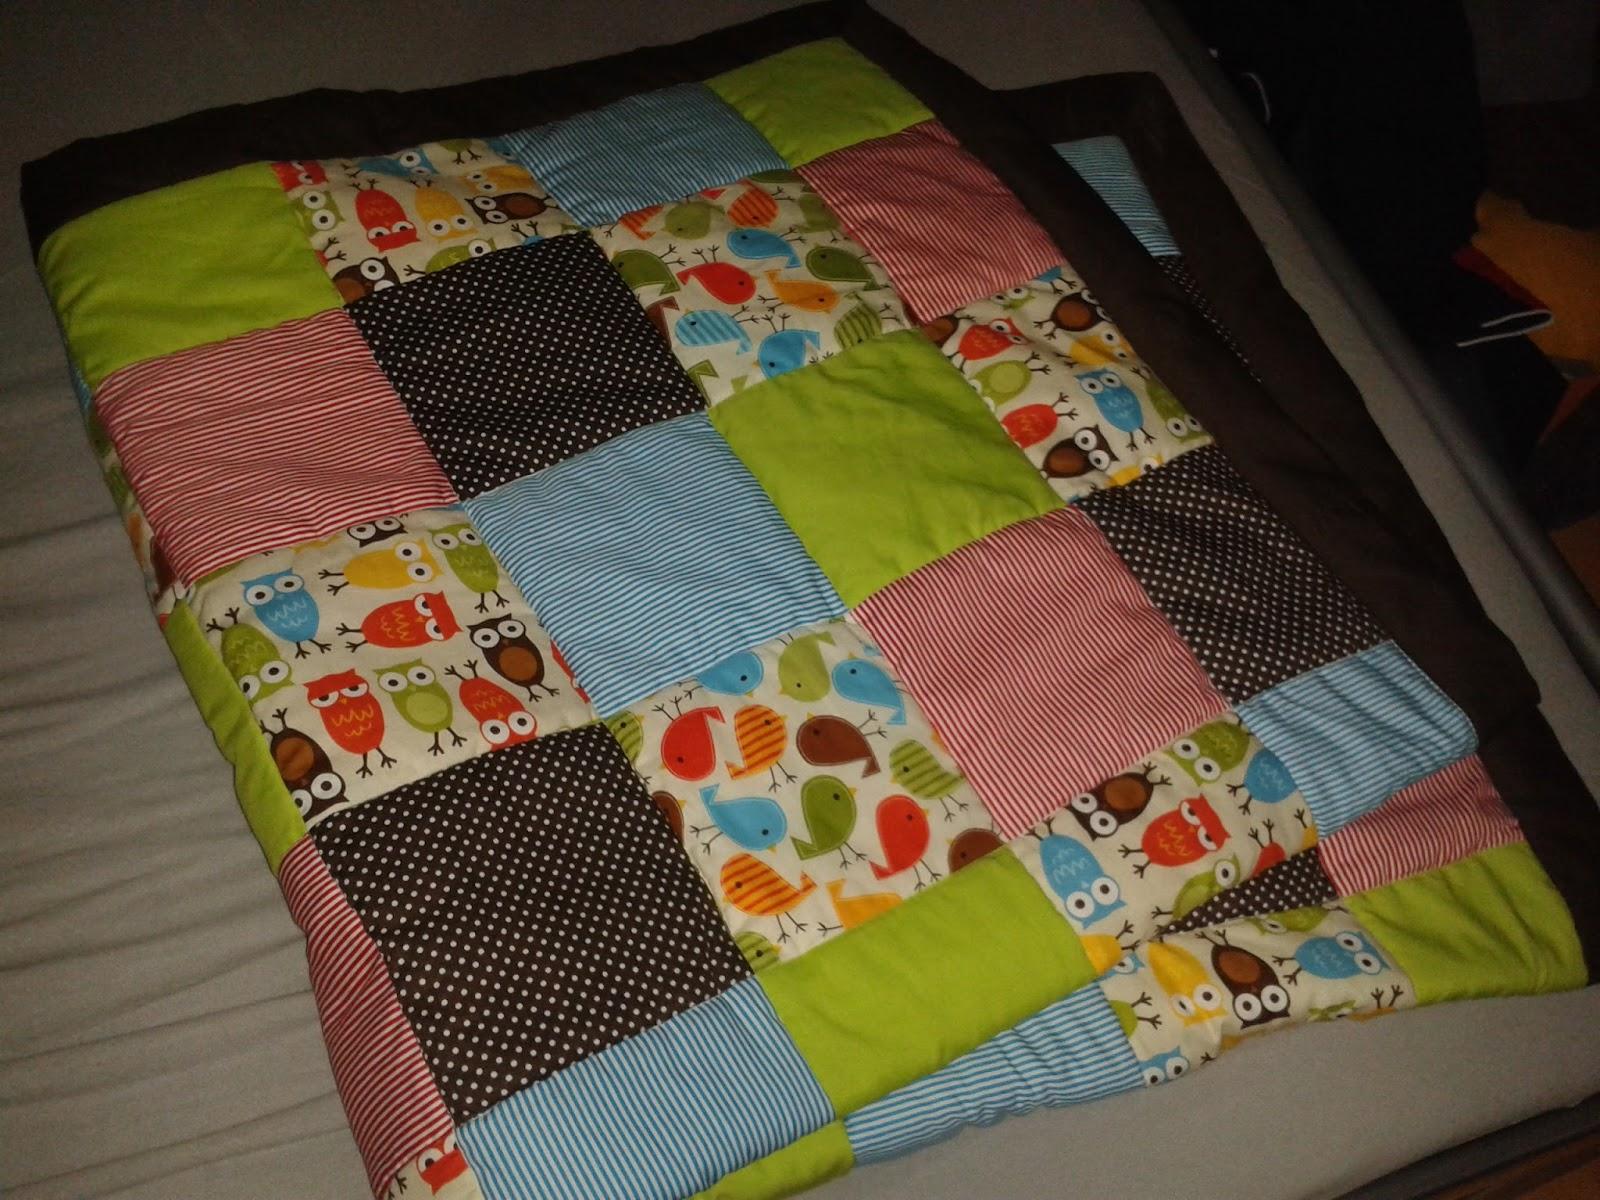 sartrix weil n hen leidenschaft ist patchworkdecke teil 2. Black Bedroom Furniture Sets. Home Design Ideas